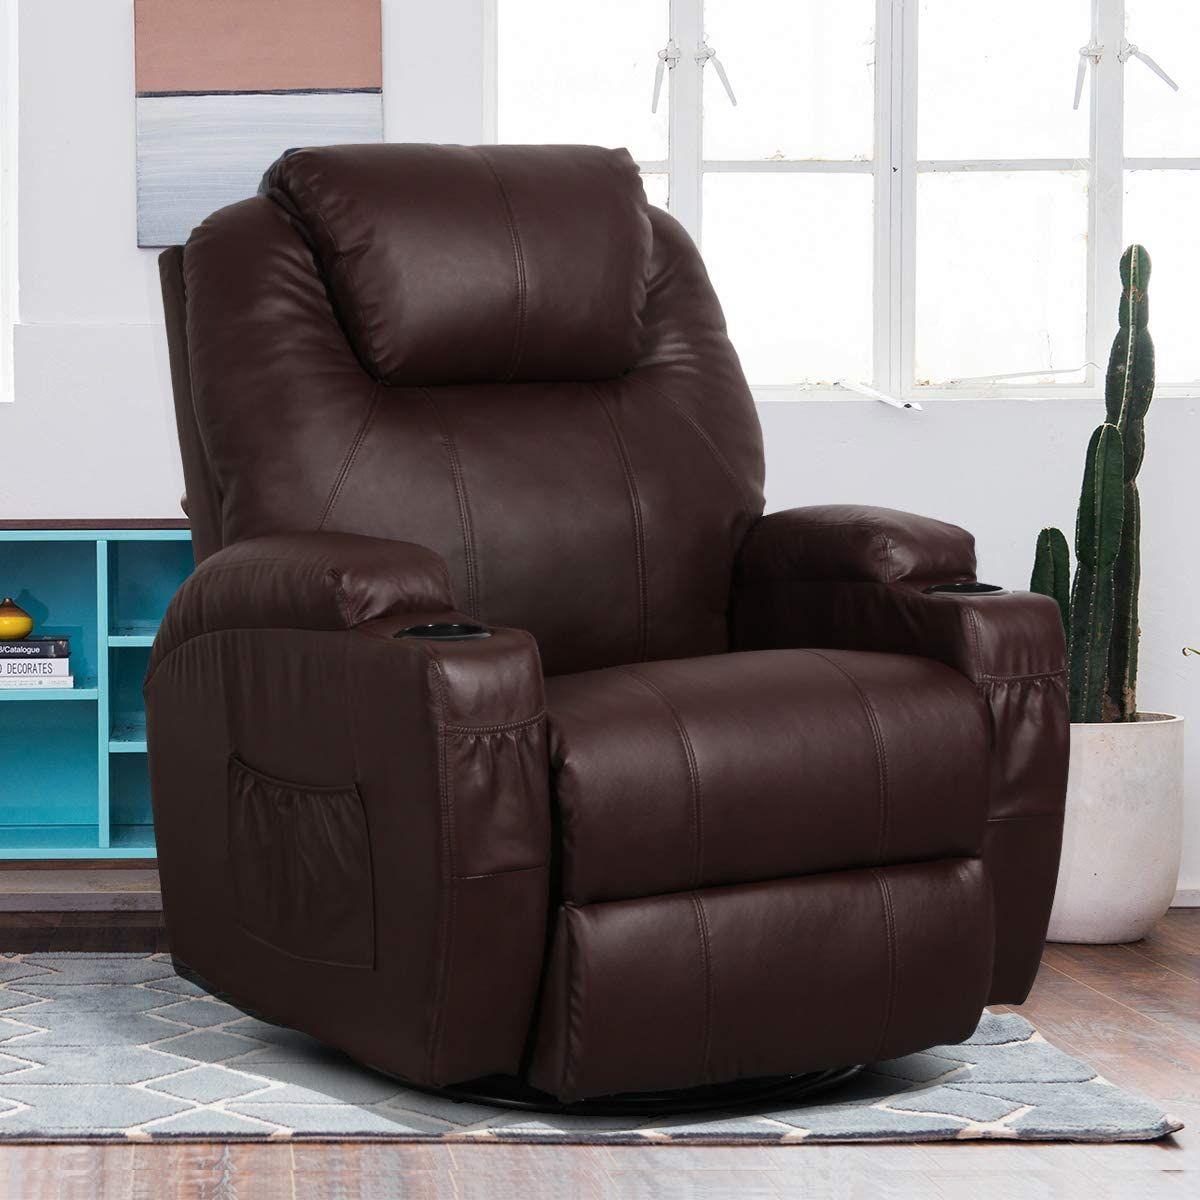 YODOLLA 360° Swivel & 140° Recling Massage Recliner Sofa